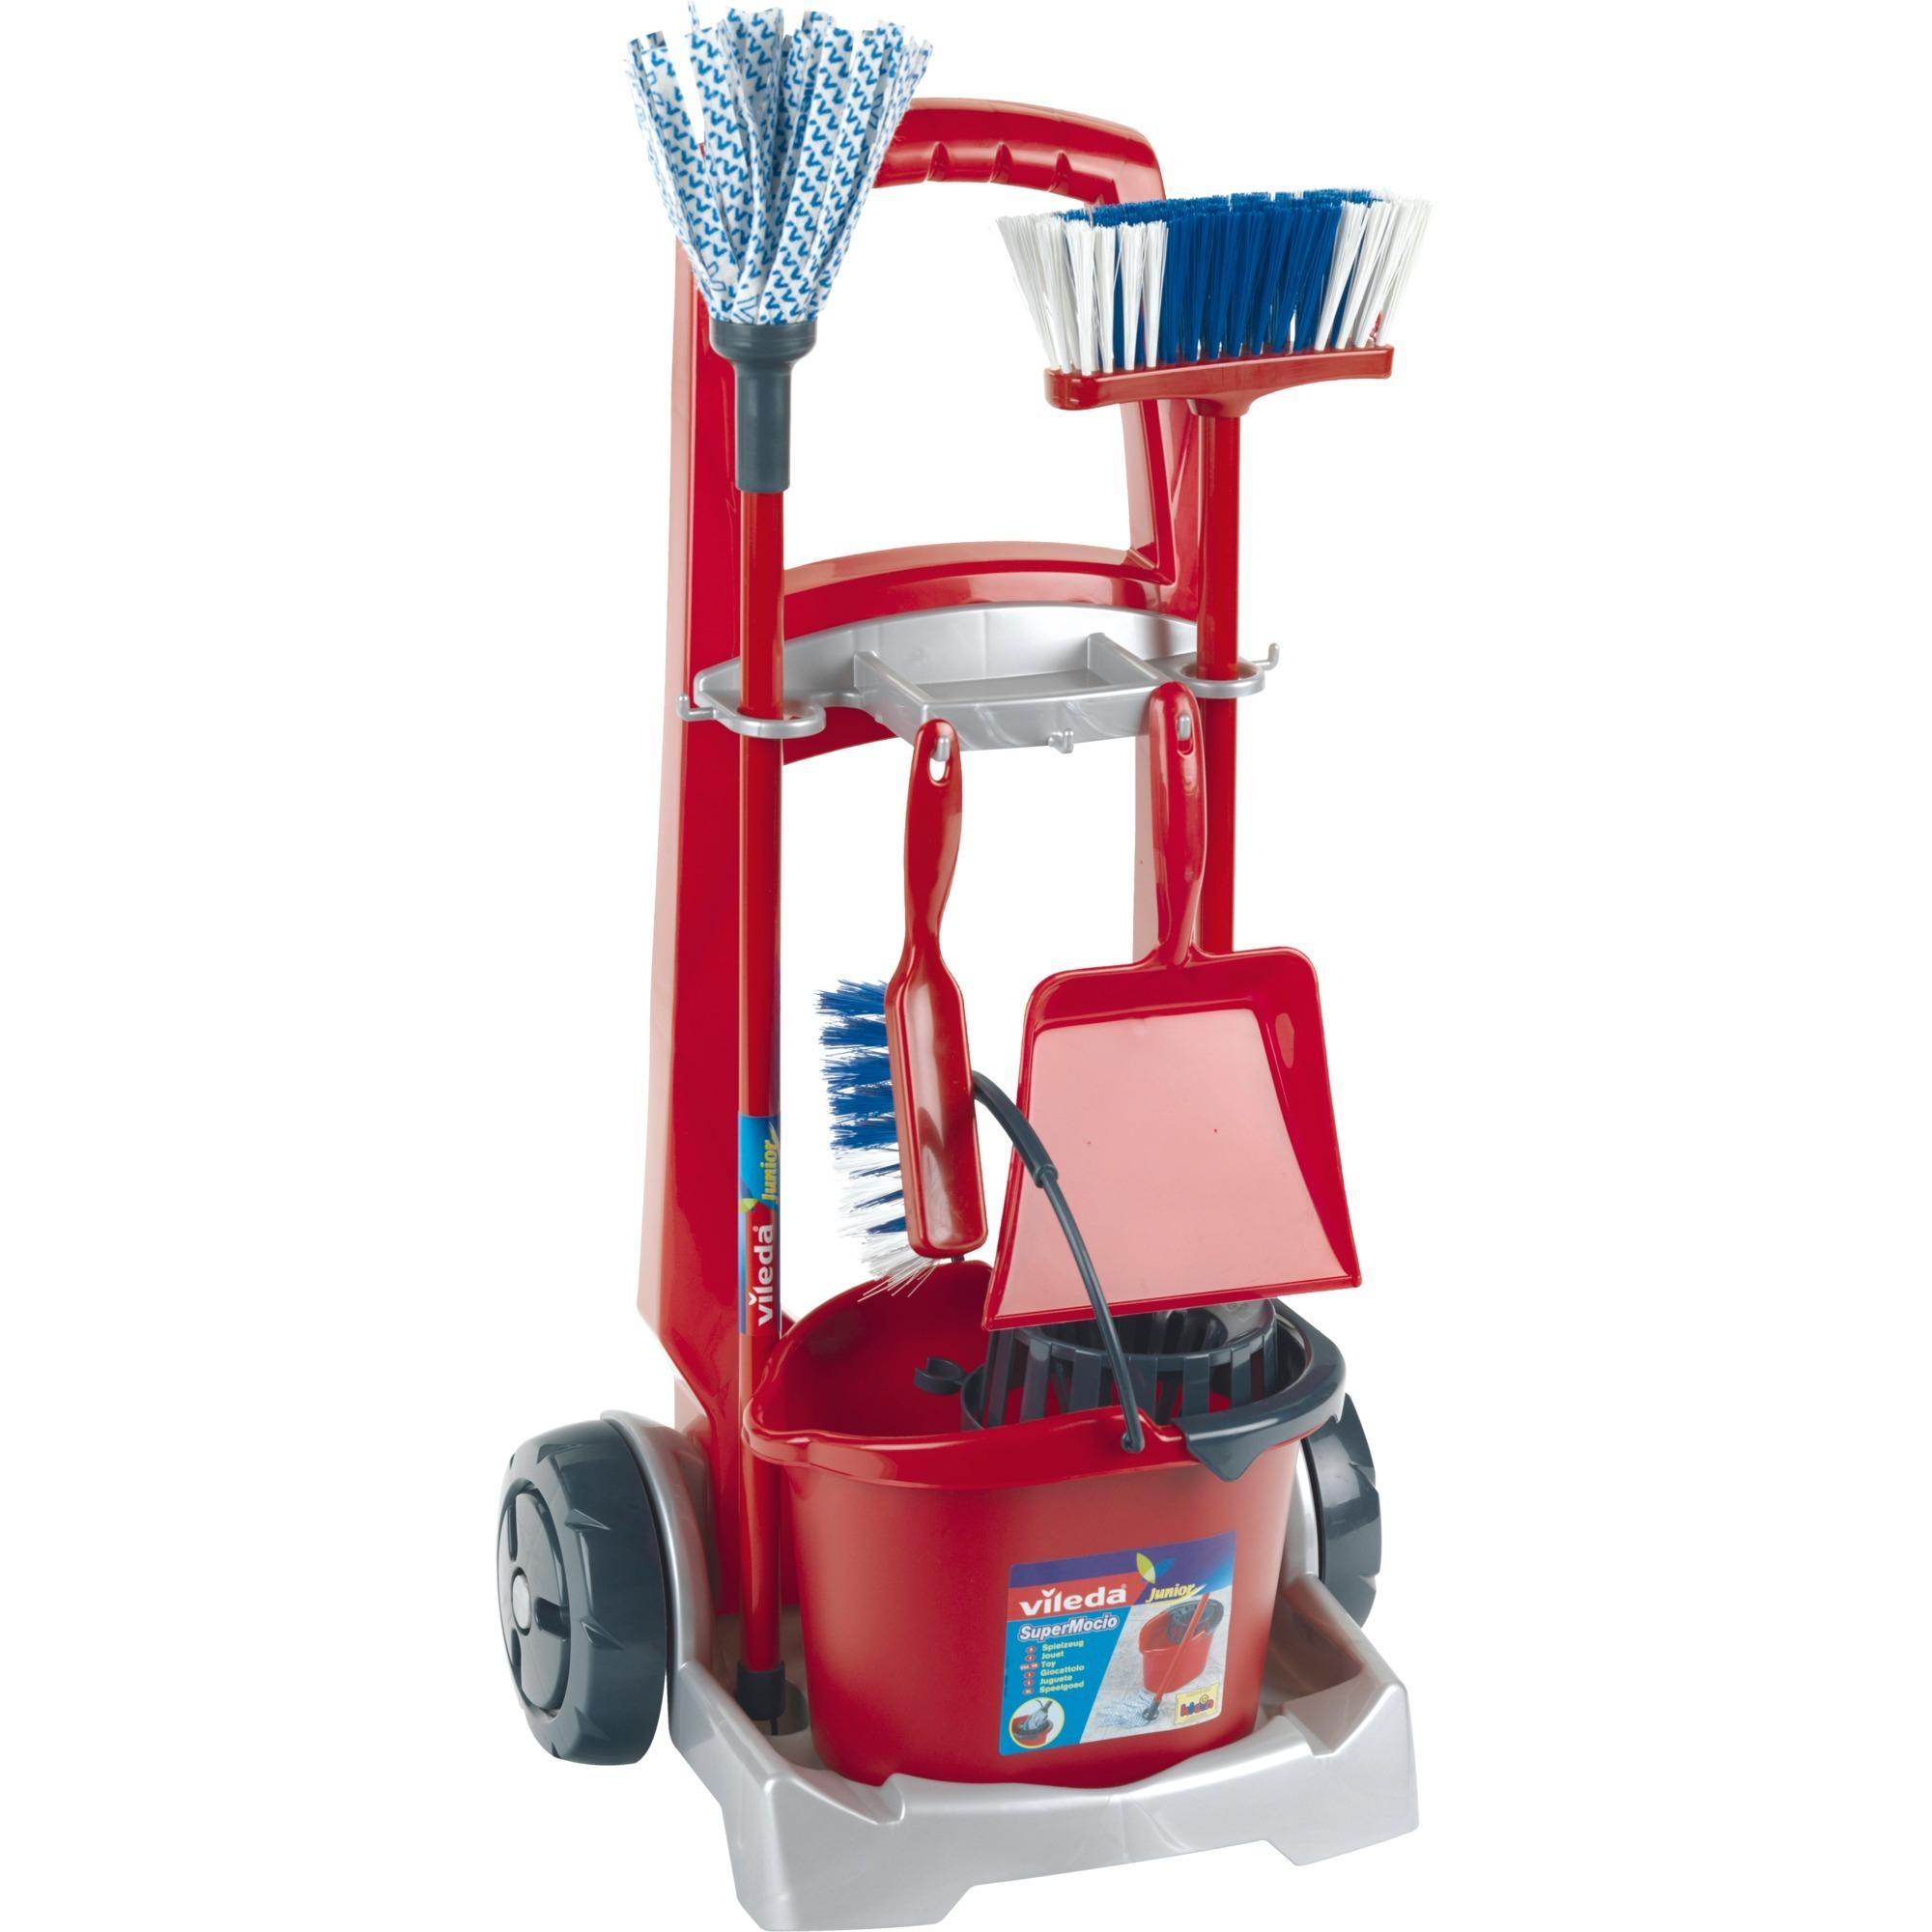 Vileda italia 147269 cleaning robot aspirapolvere autonomo - Robot aspirapolvere folletto prezzi ...